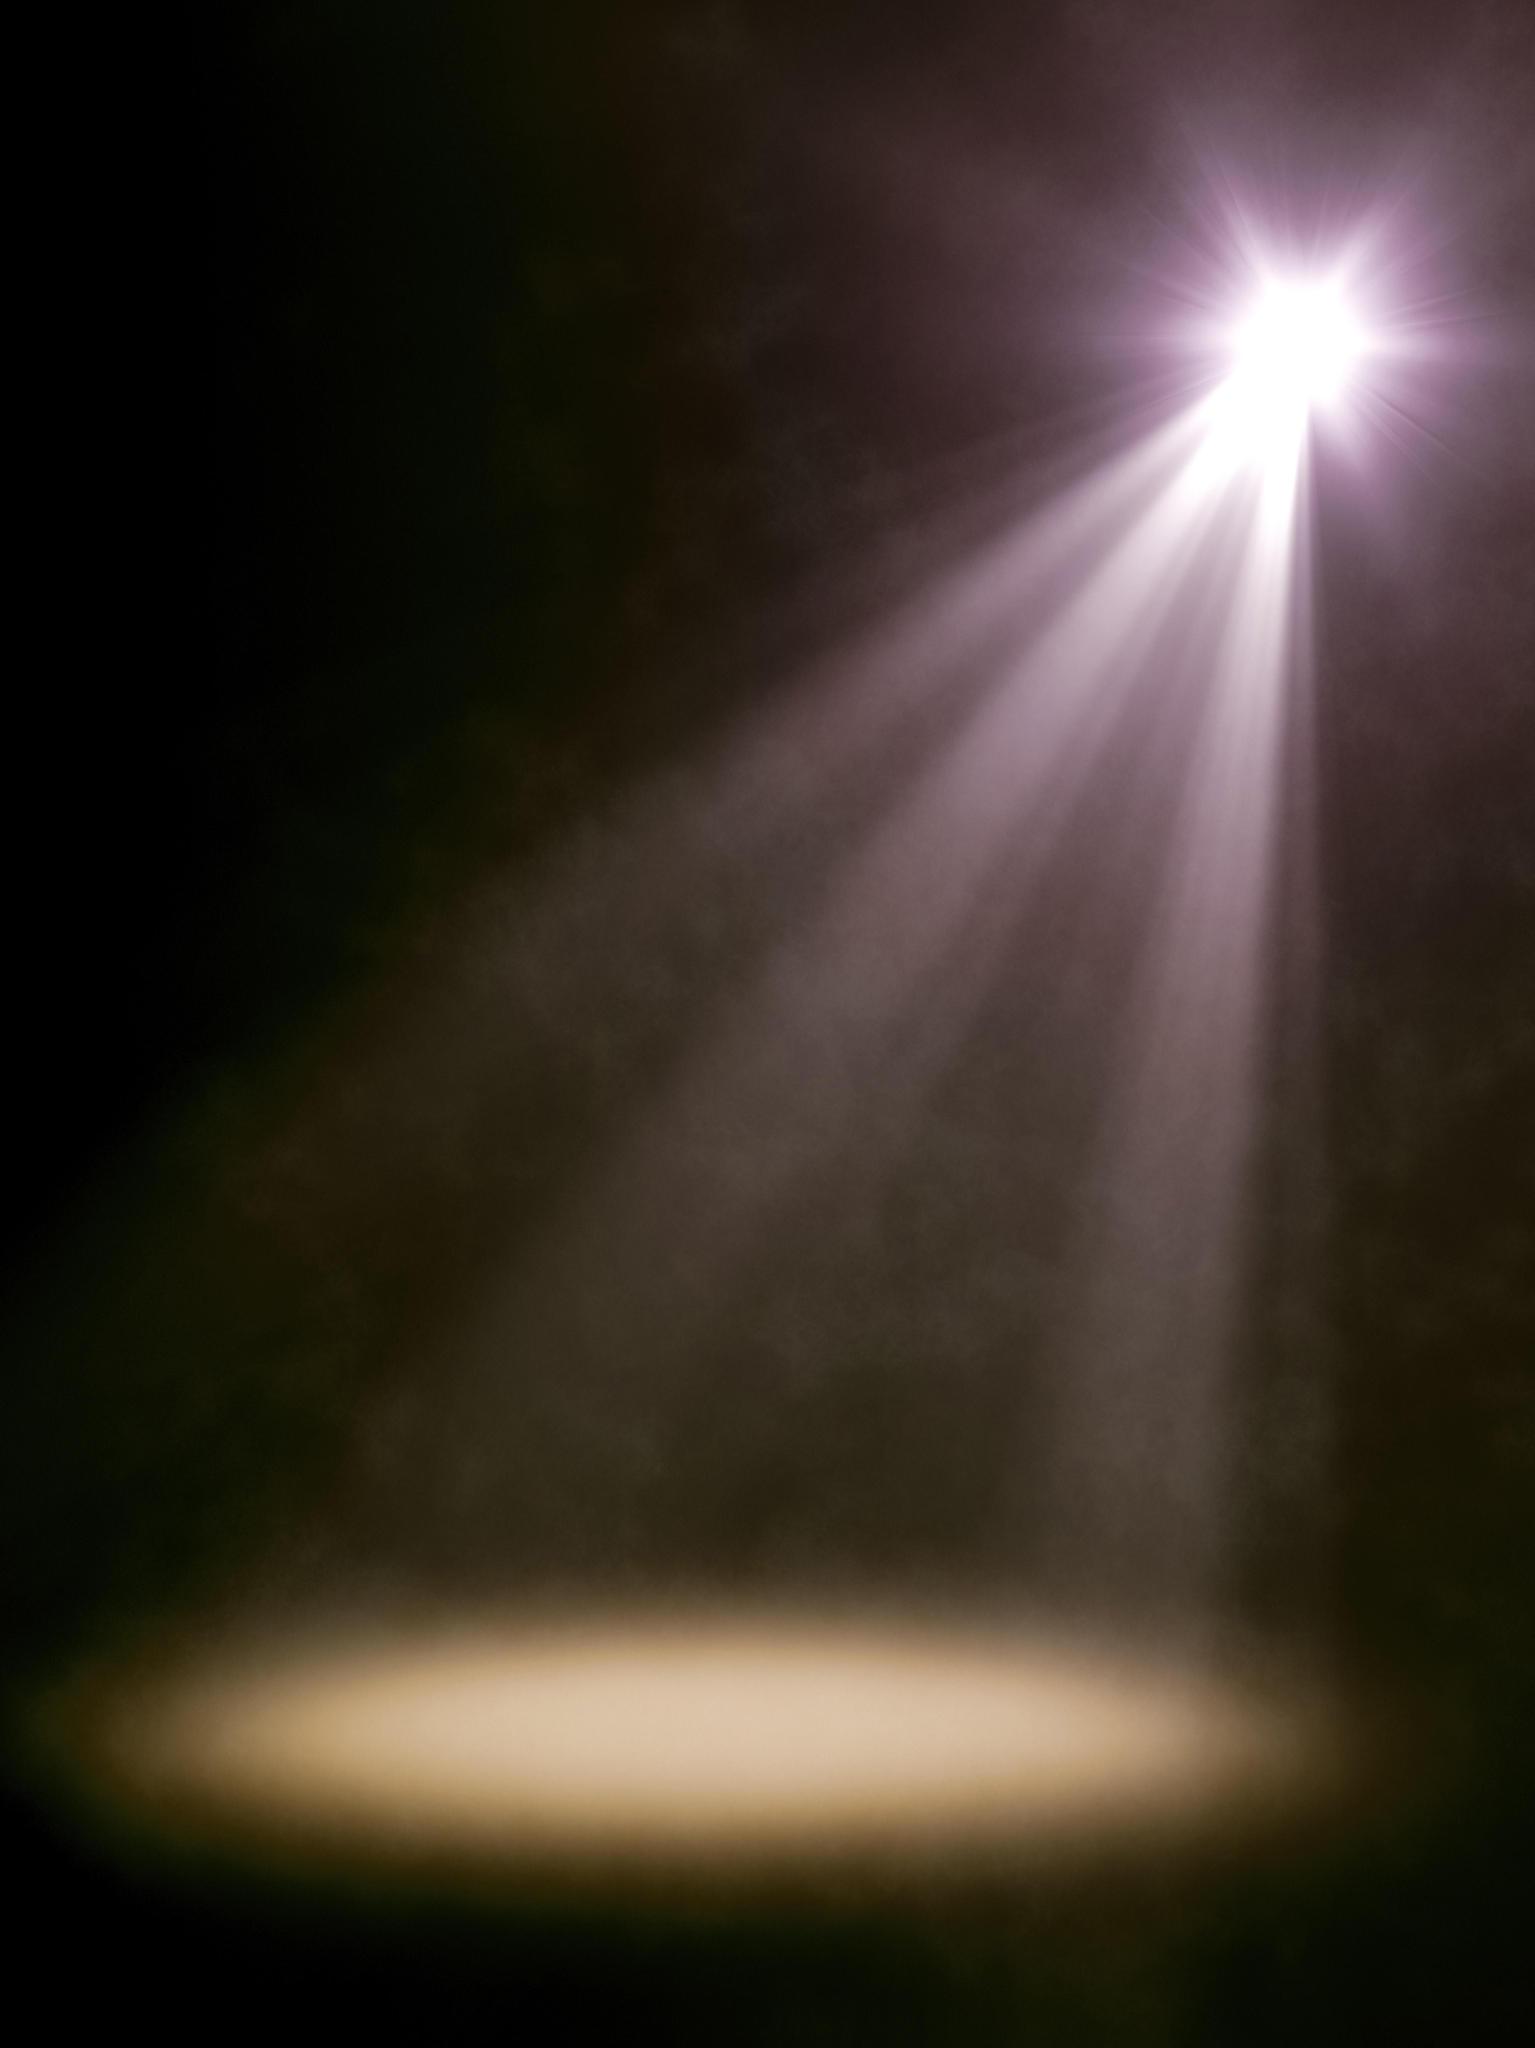 leere Bühne (Symbolbild)